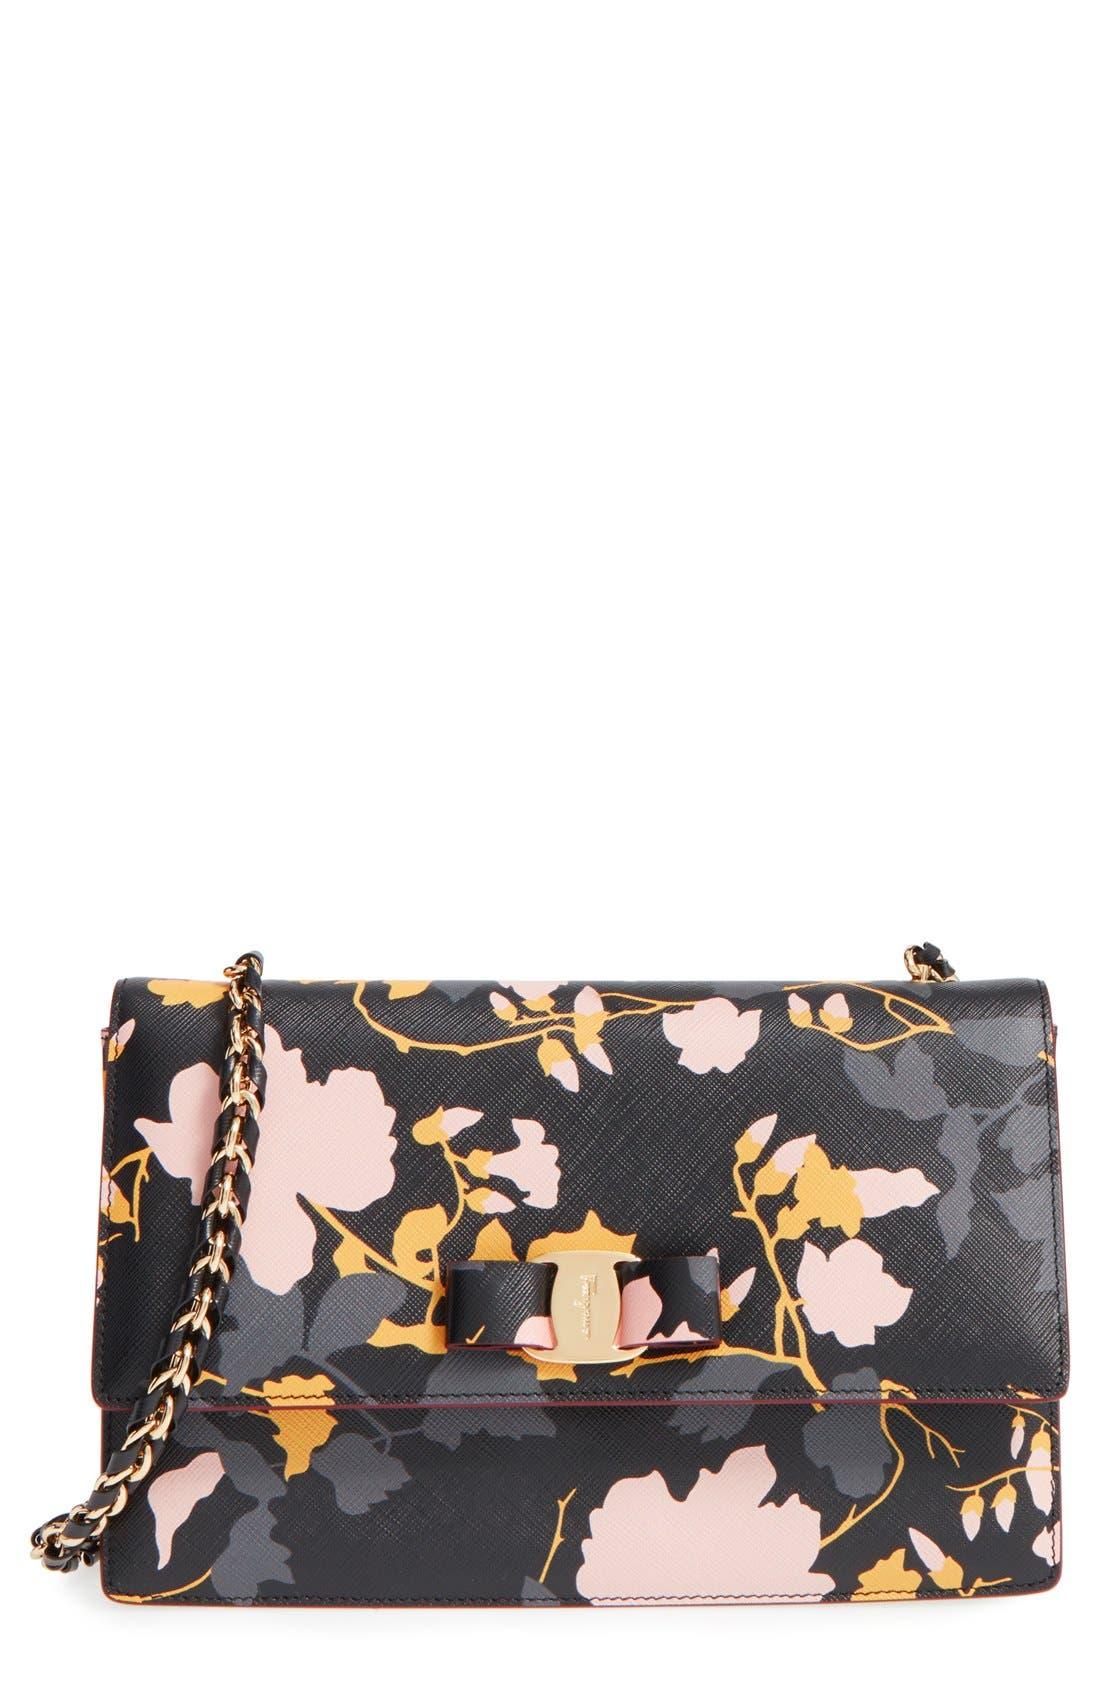 Main Image - Salvatore Ferragamo 'Medium Ginny Floral' Shoulder Bag